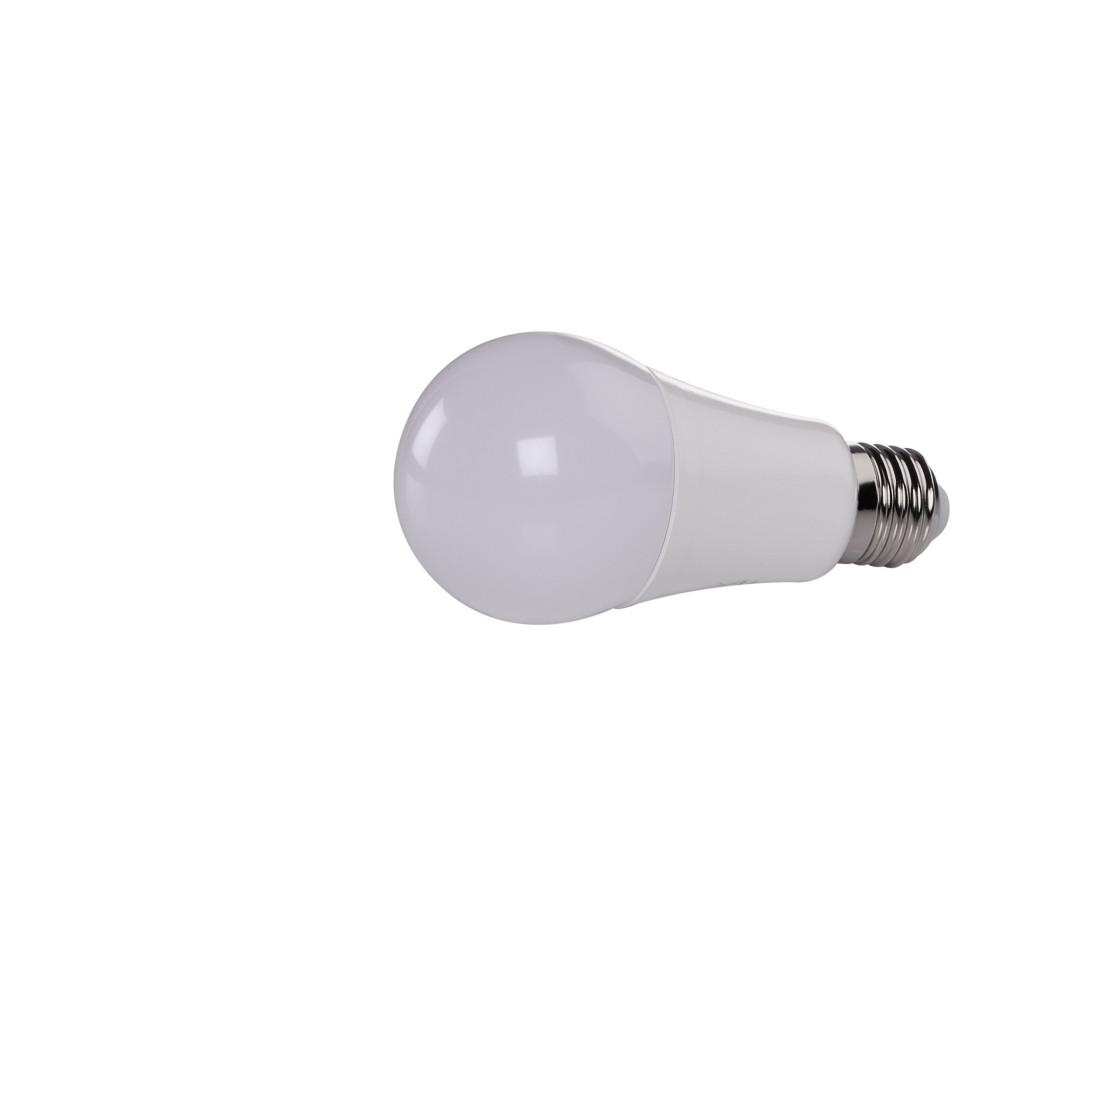 Xavax 00112187 xavax led lampe e27 806lm ersetzt 60w dex3 druckfhiges detail 3 xavax led lampe e27 806lm ersetzt 60w parisarafo Images